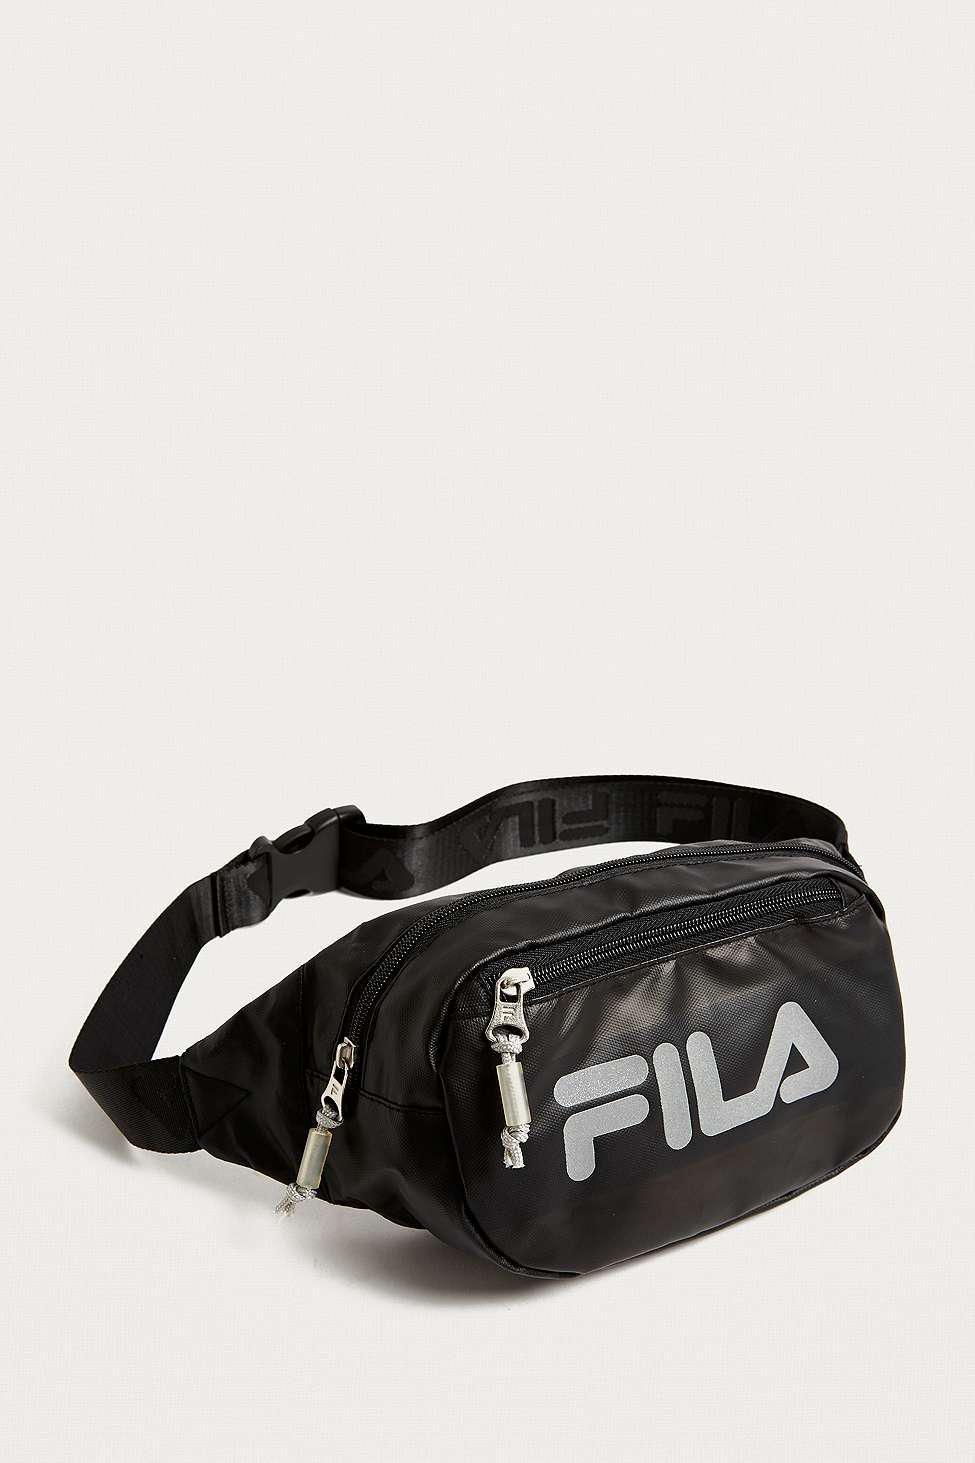 Fila Reflective Black Cross Body Bag in Black for Men - Lyst 50688a9d2e8bd